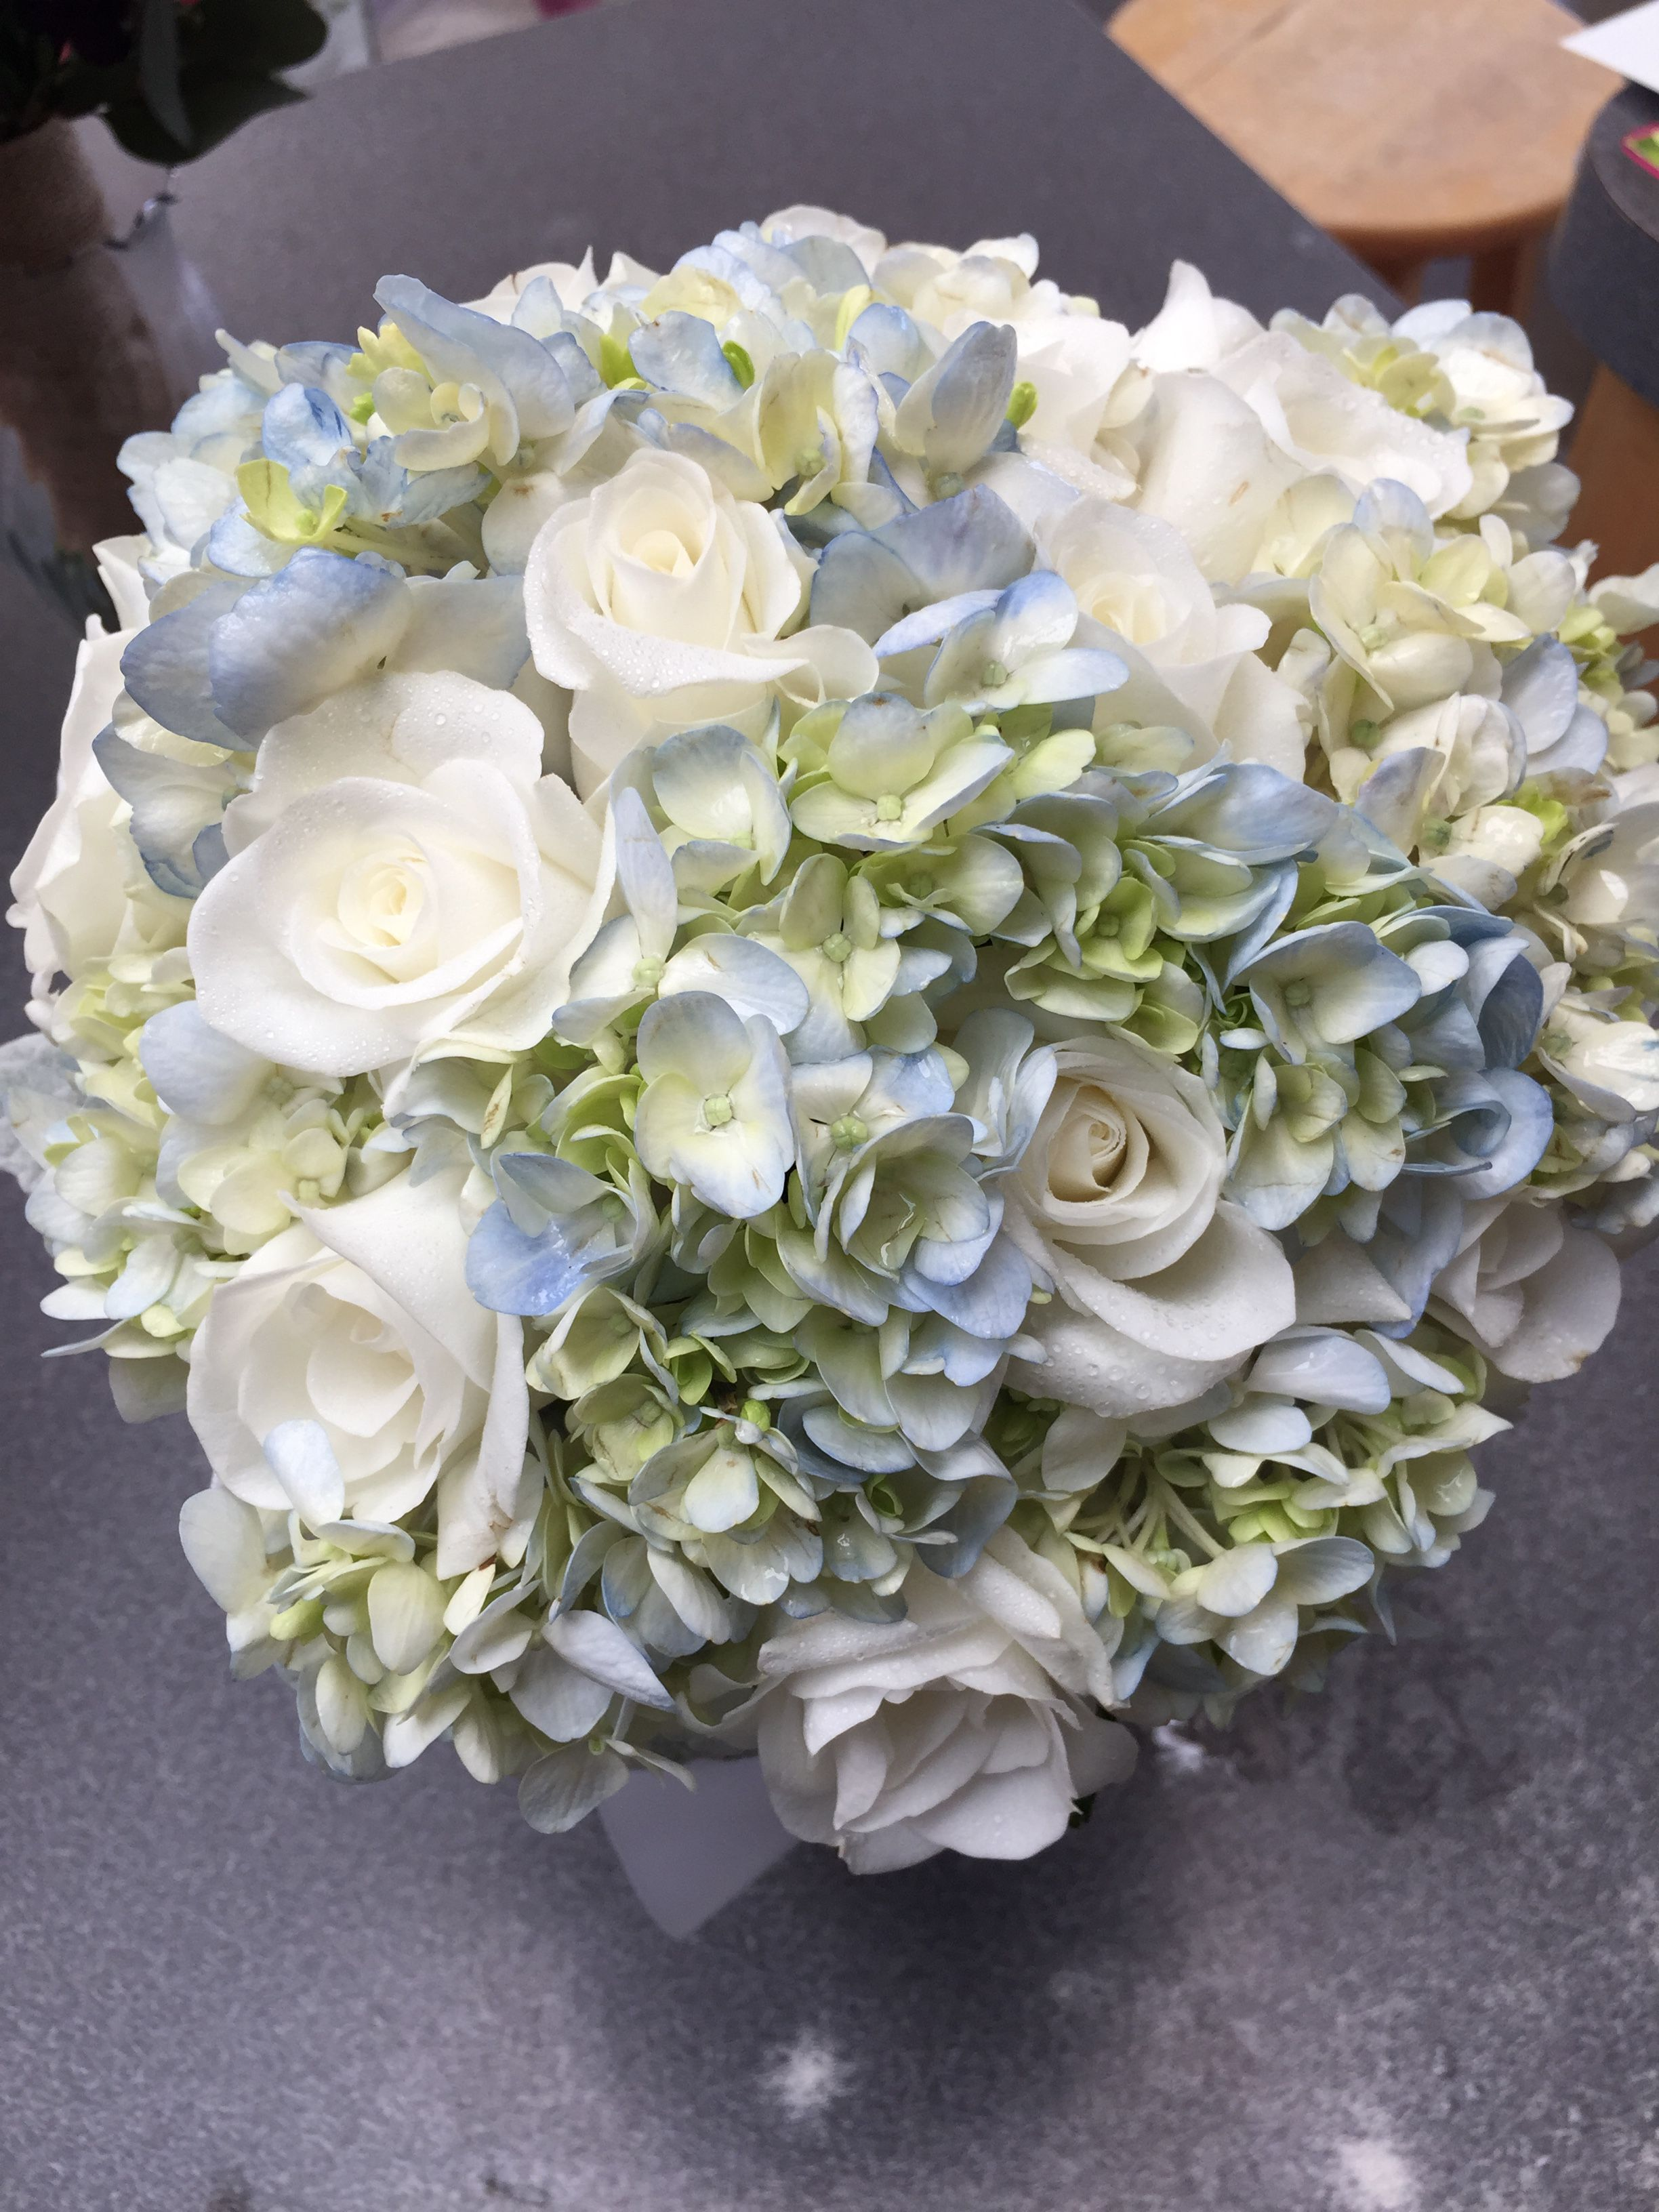 Quenseneria Bouquet Of Blue Hydrangea And White Roses Nosegay